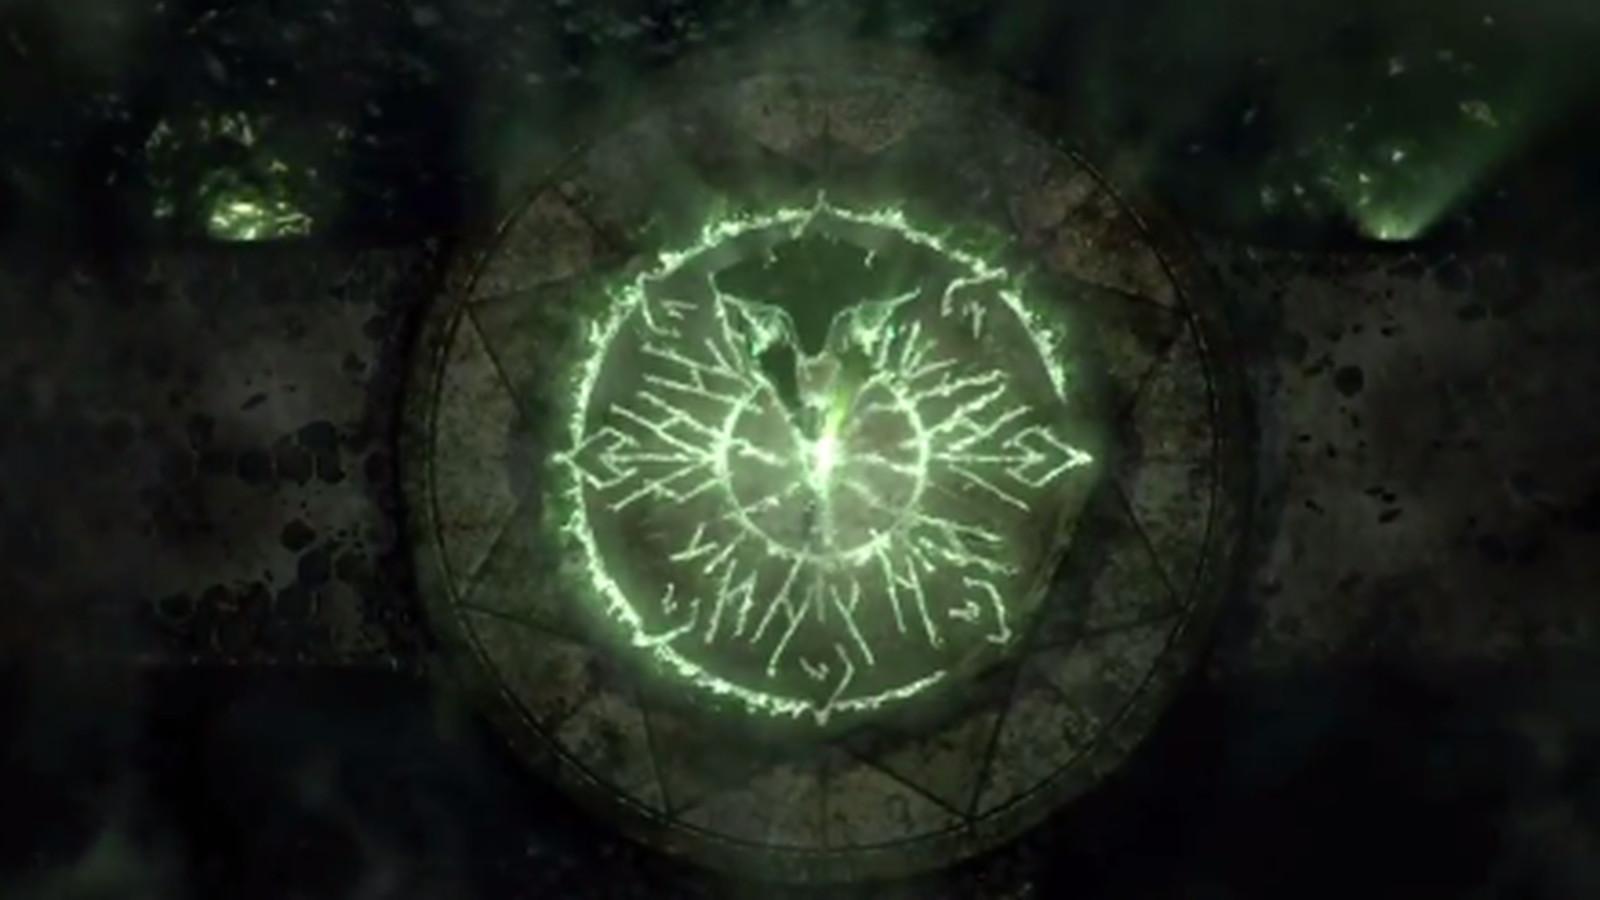 Destiny S The Dark Below Dlc Cinematic Leaks Watch It Now